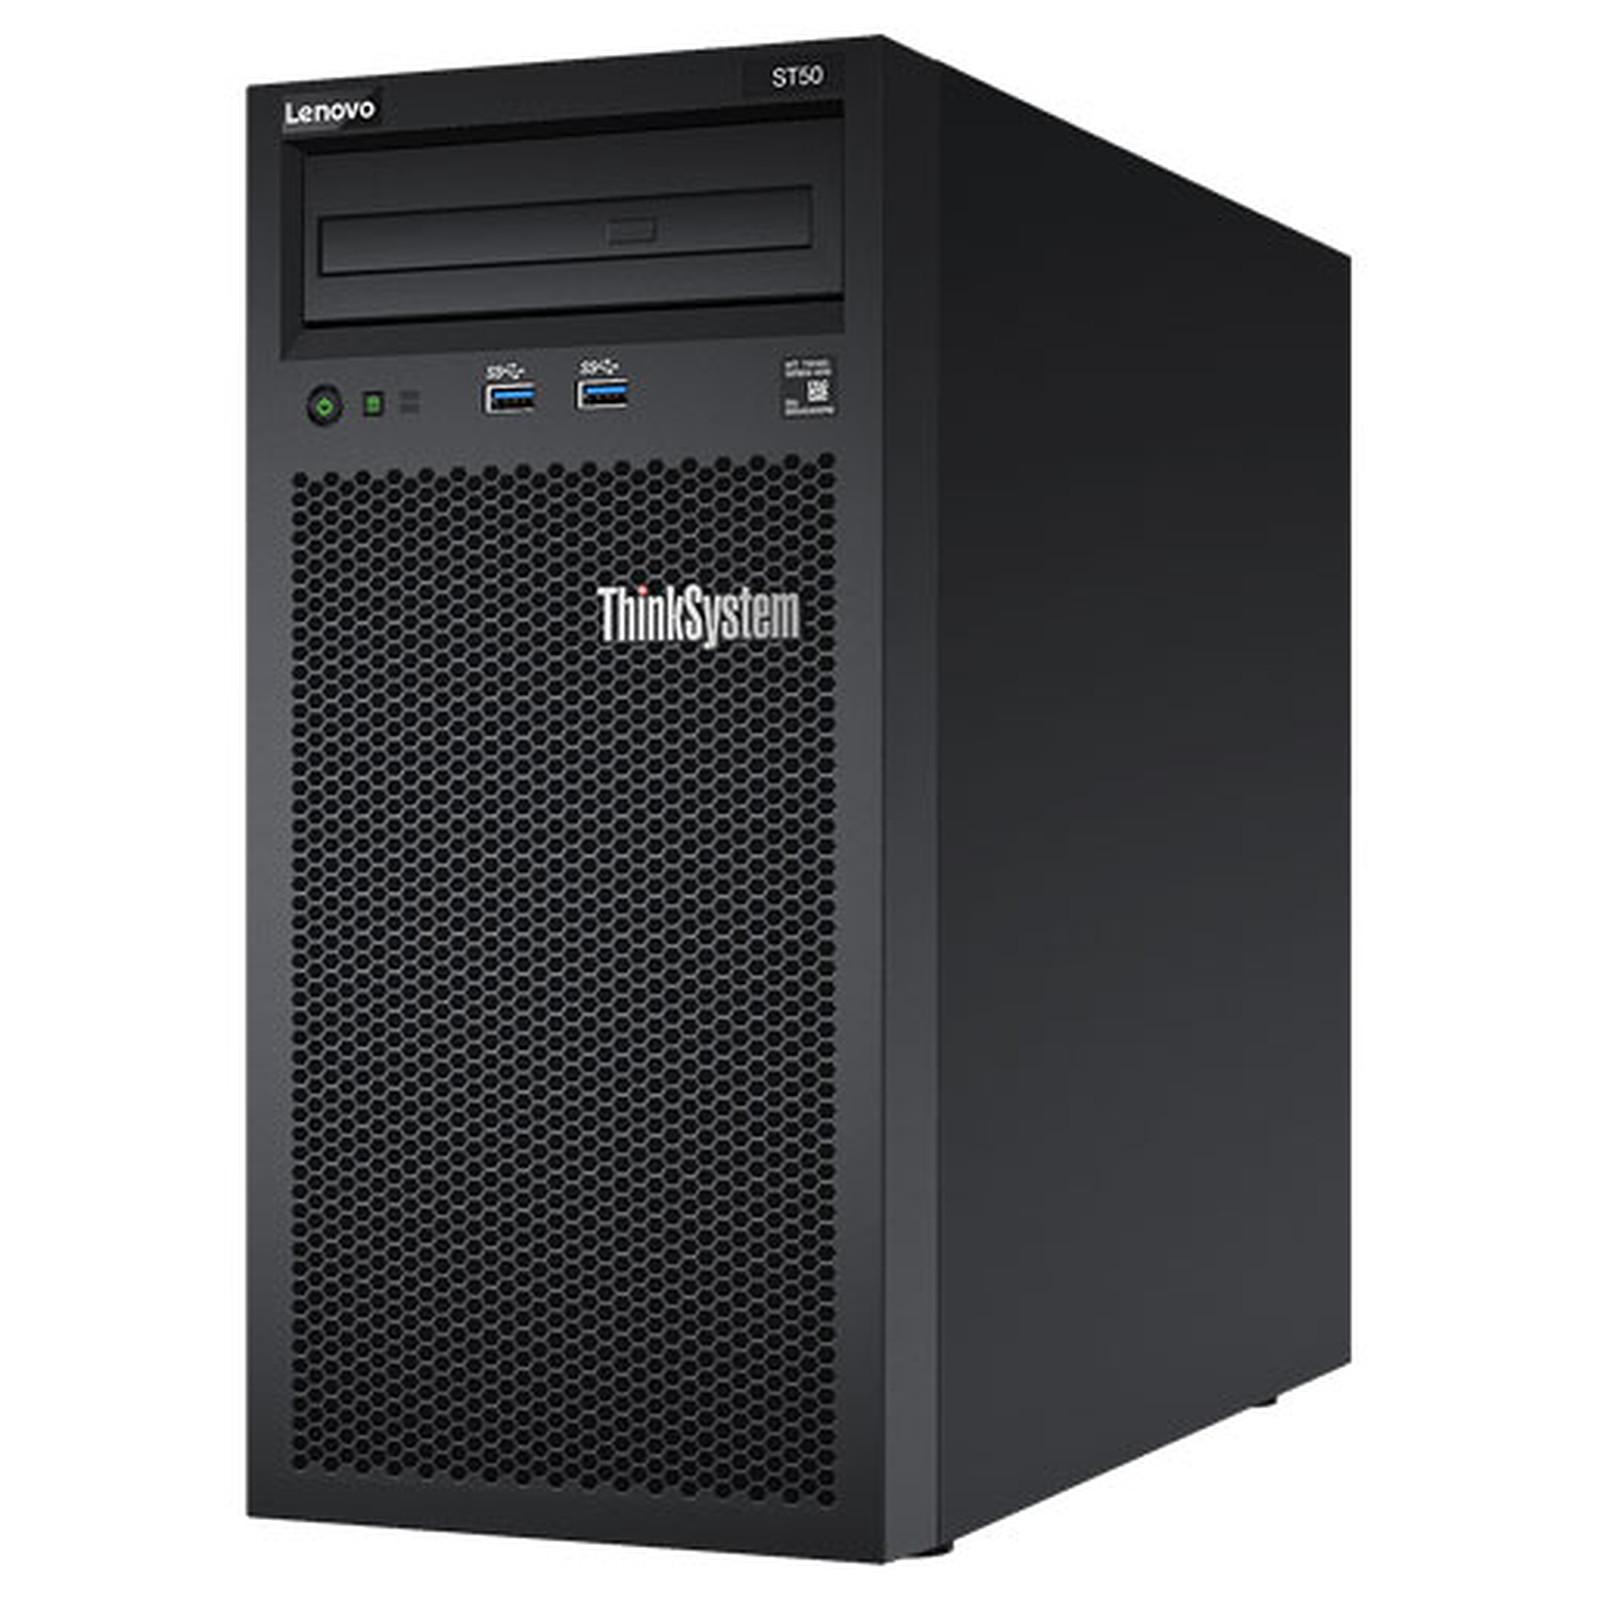 Lenovo ThinkSystem ST50 (7Y48A008EA)